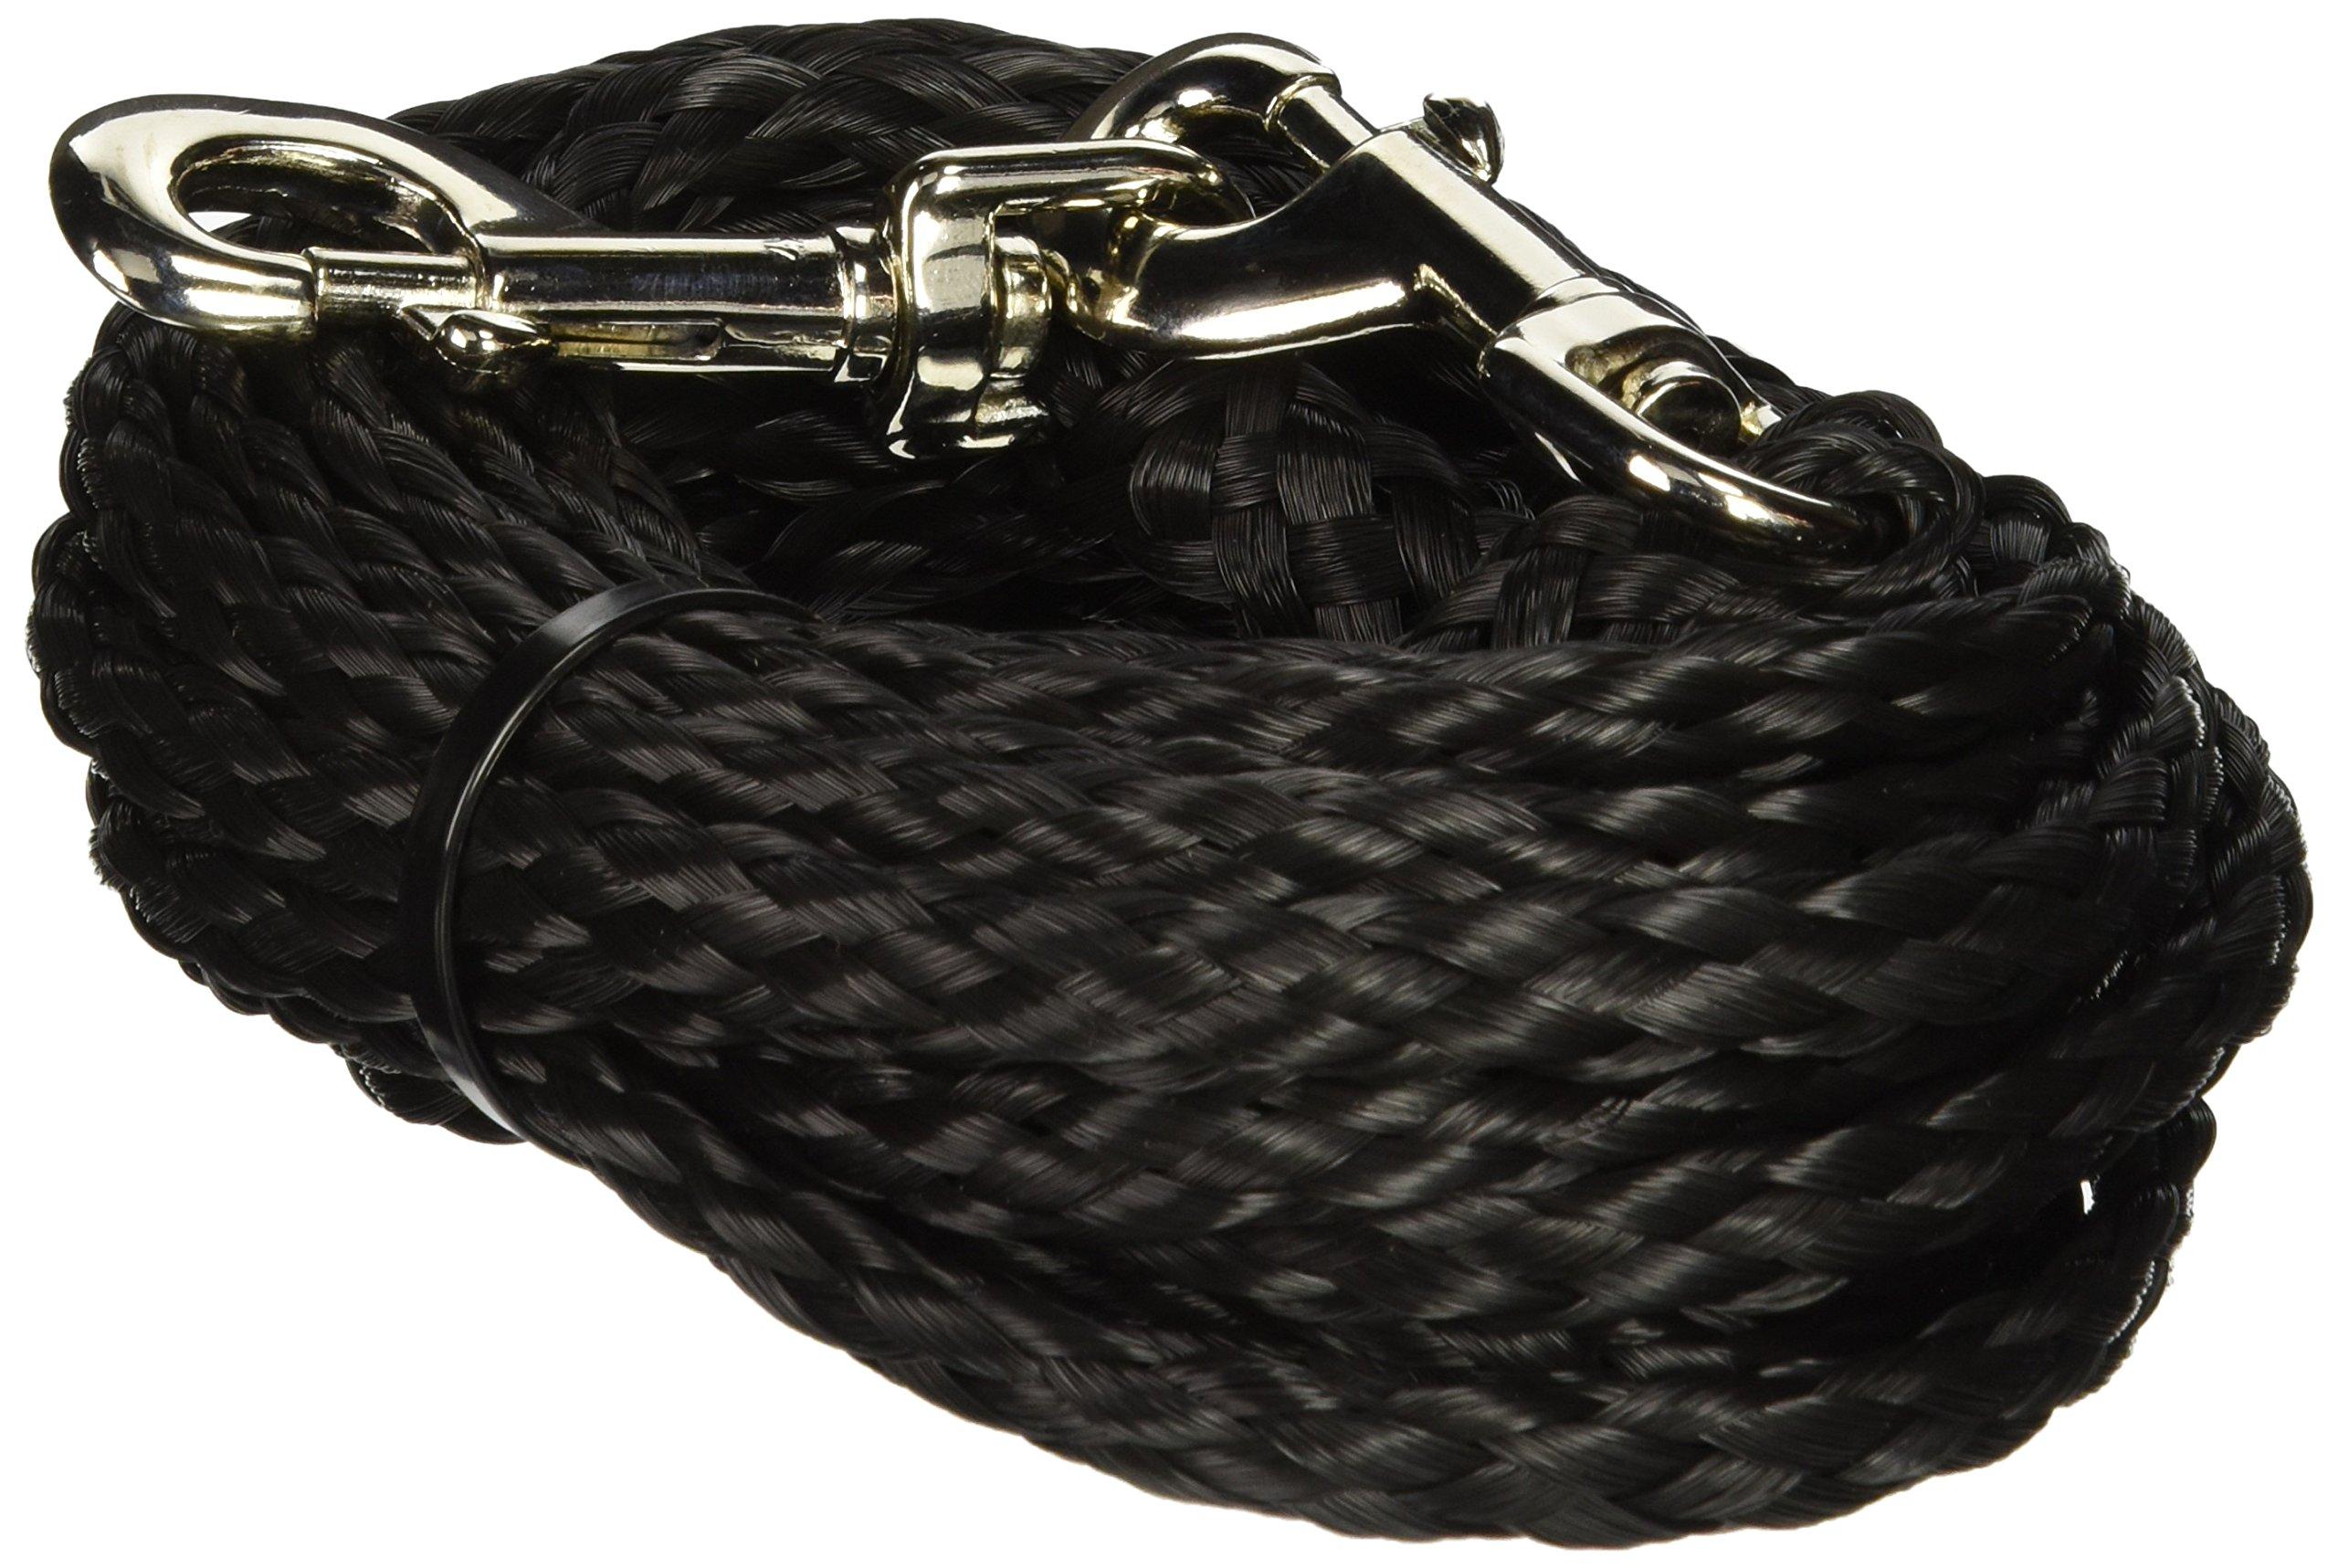 Coastal Pet Products DCP33320BLK Nylon Poly Big Dog Tie Out, 20-Feet, Black by Coastal Pet